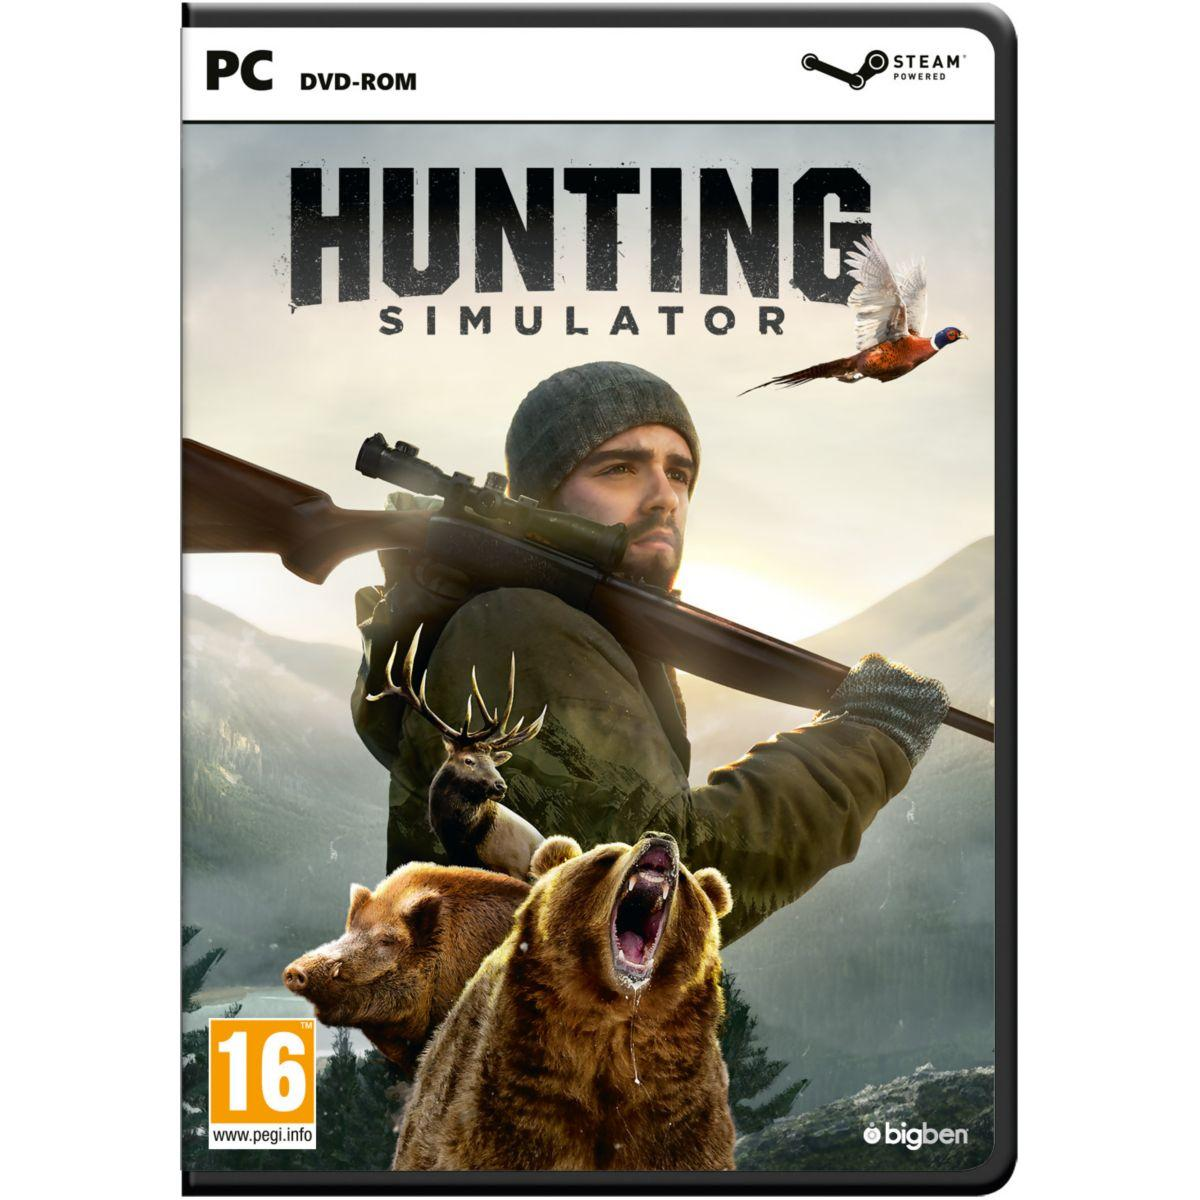 Jeu pc bigben hunting - 7% de remise immédiate avec le code : multi7 (photo)